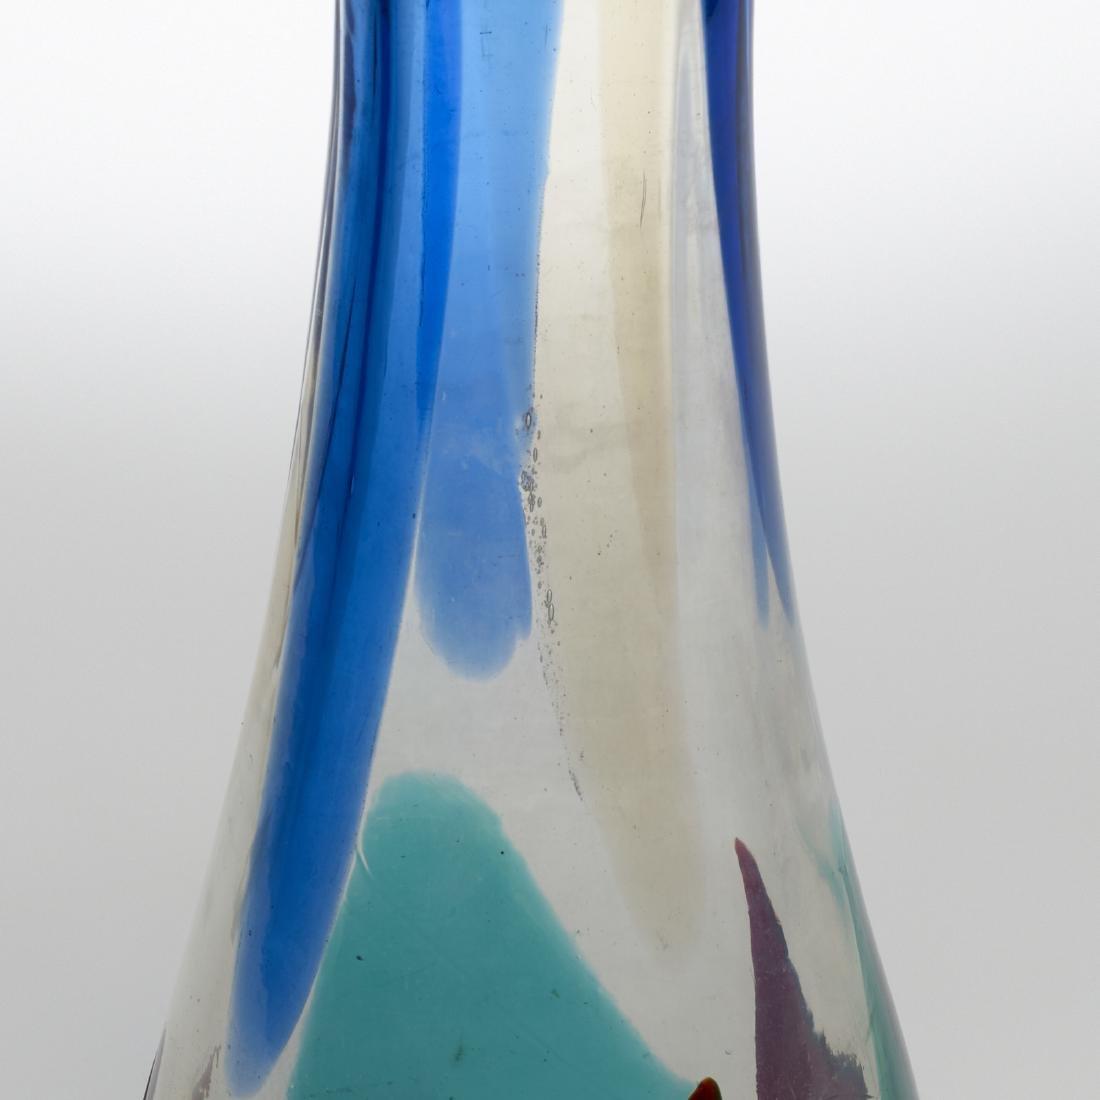 Fulvio Bianconi, Rare Pezzame vase, model 4394 - 2